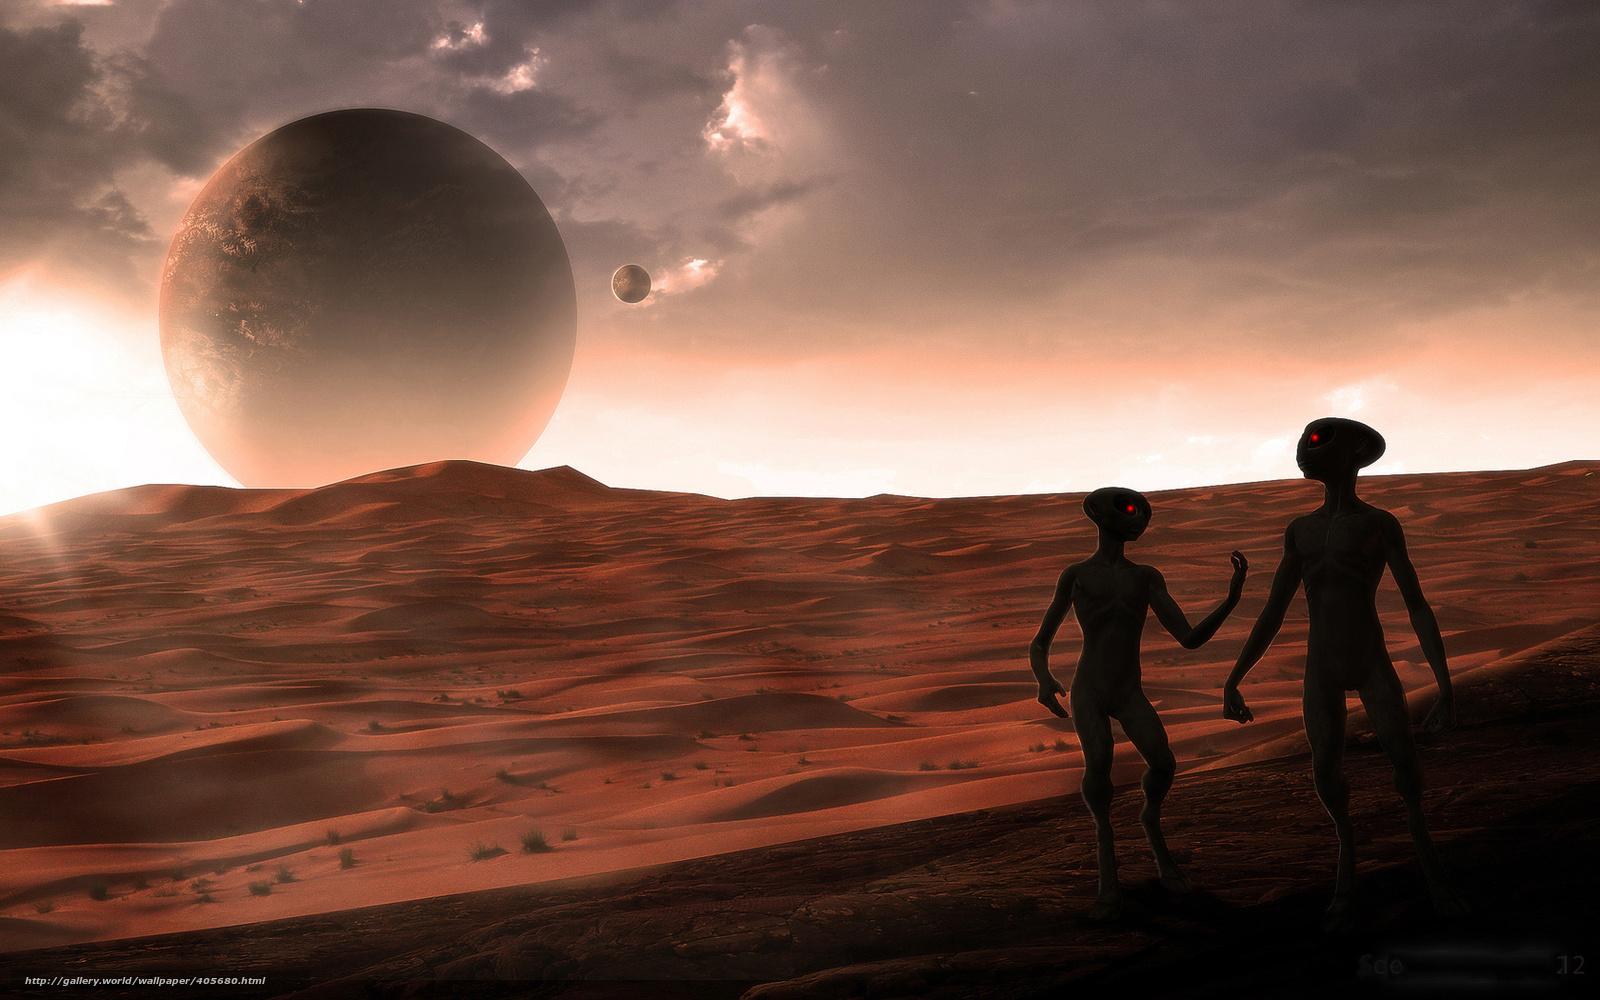 Tlcharger Fond D Ecran Plante Mars Trangers Martiens